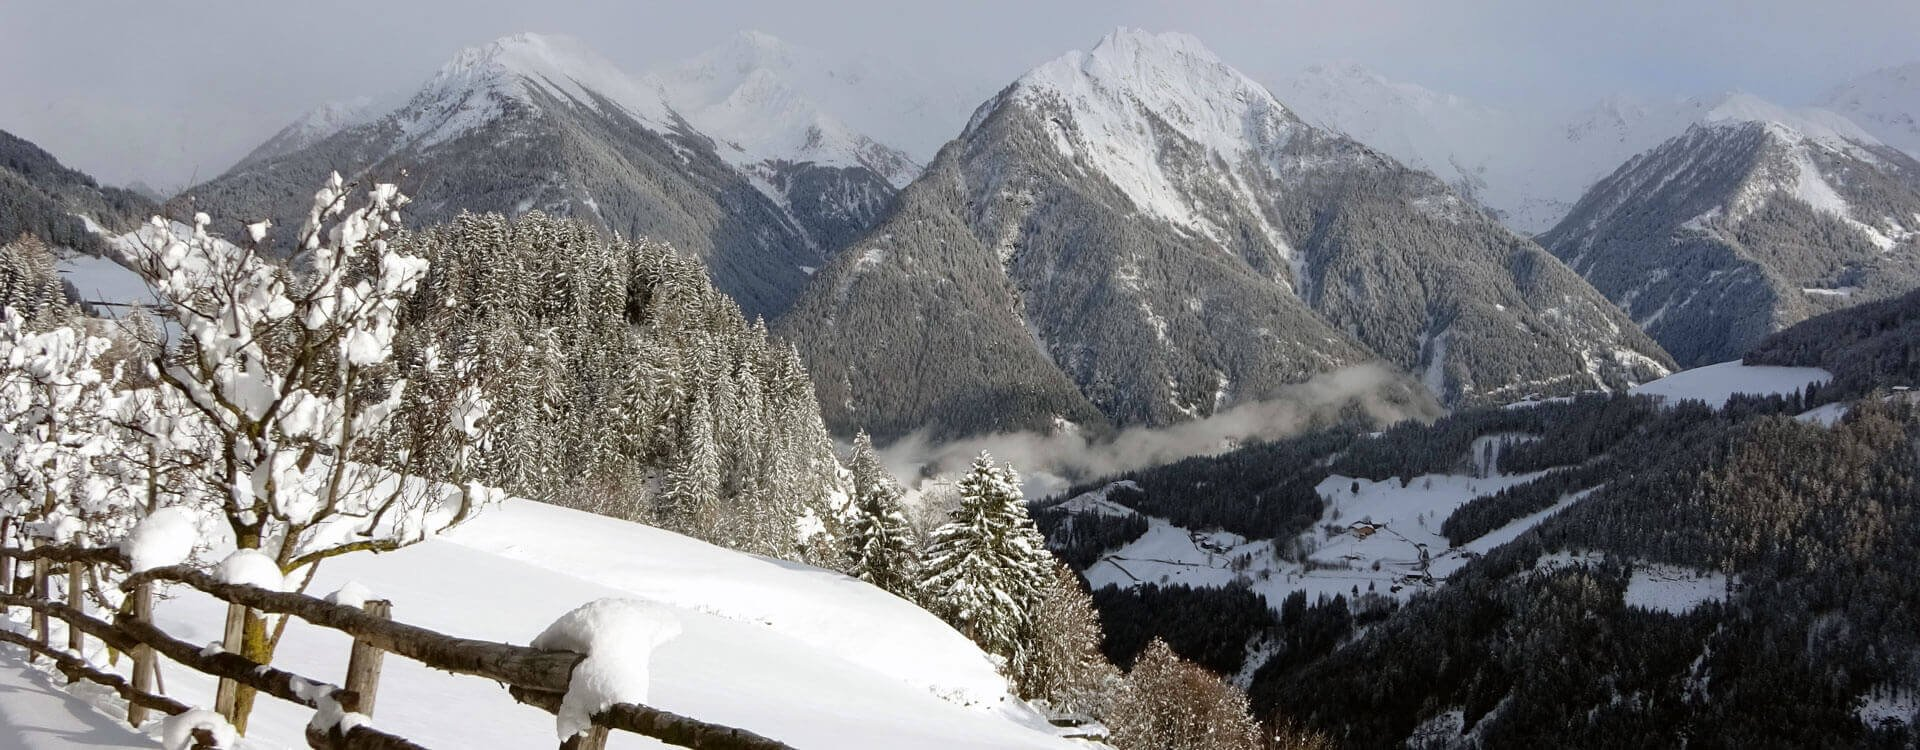 winterurlaub-passeiertal-suedtirol-3